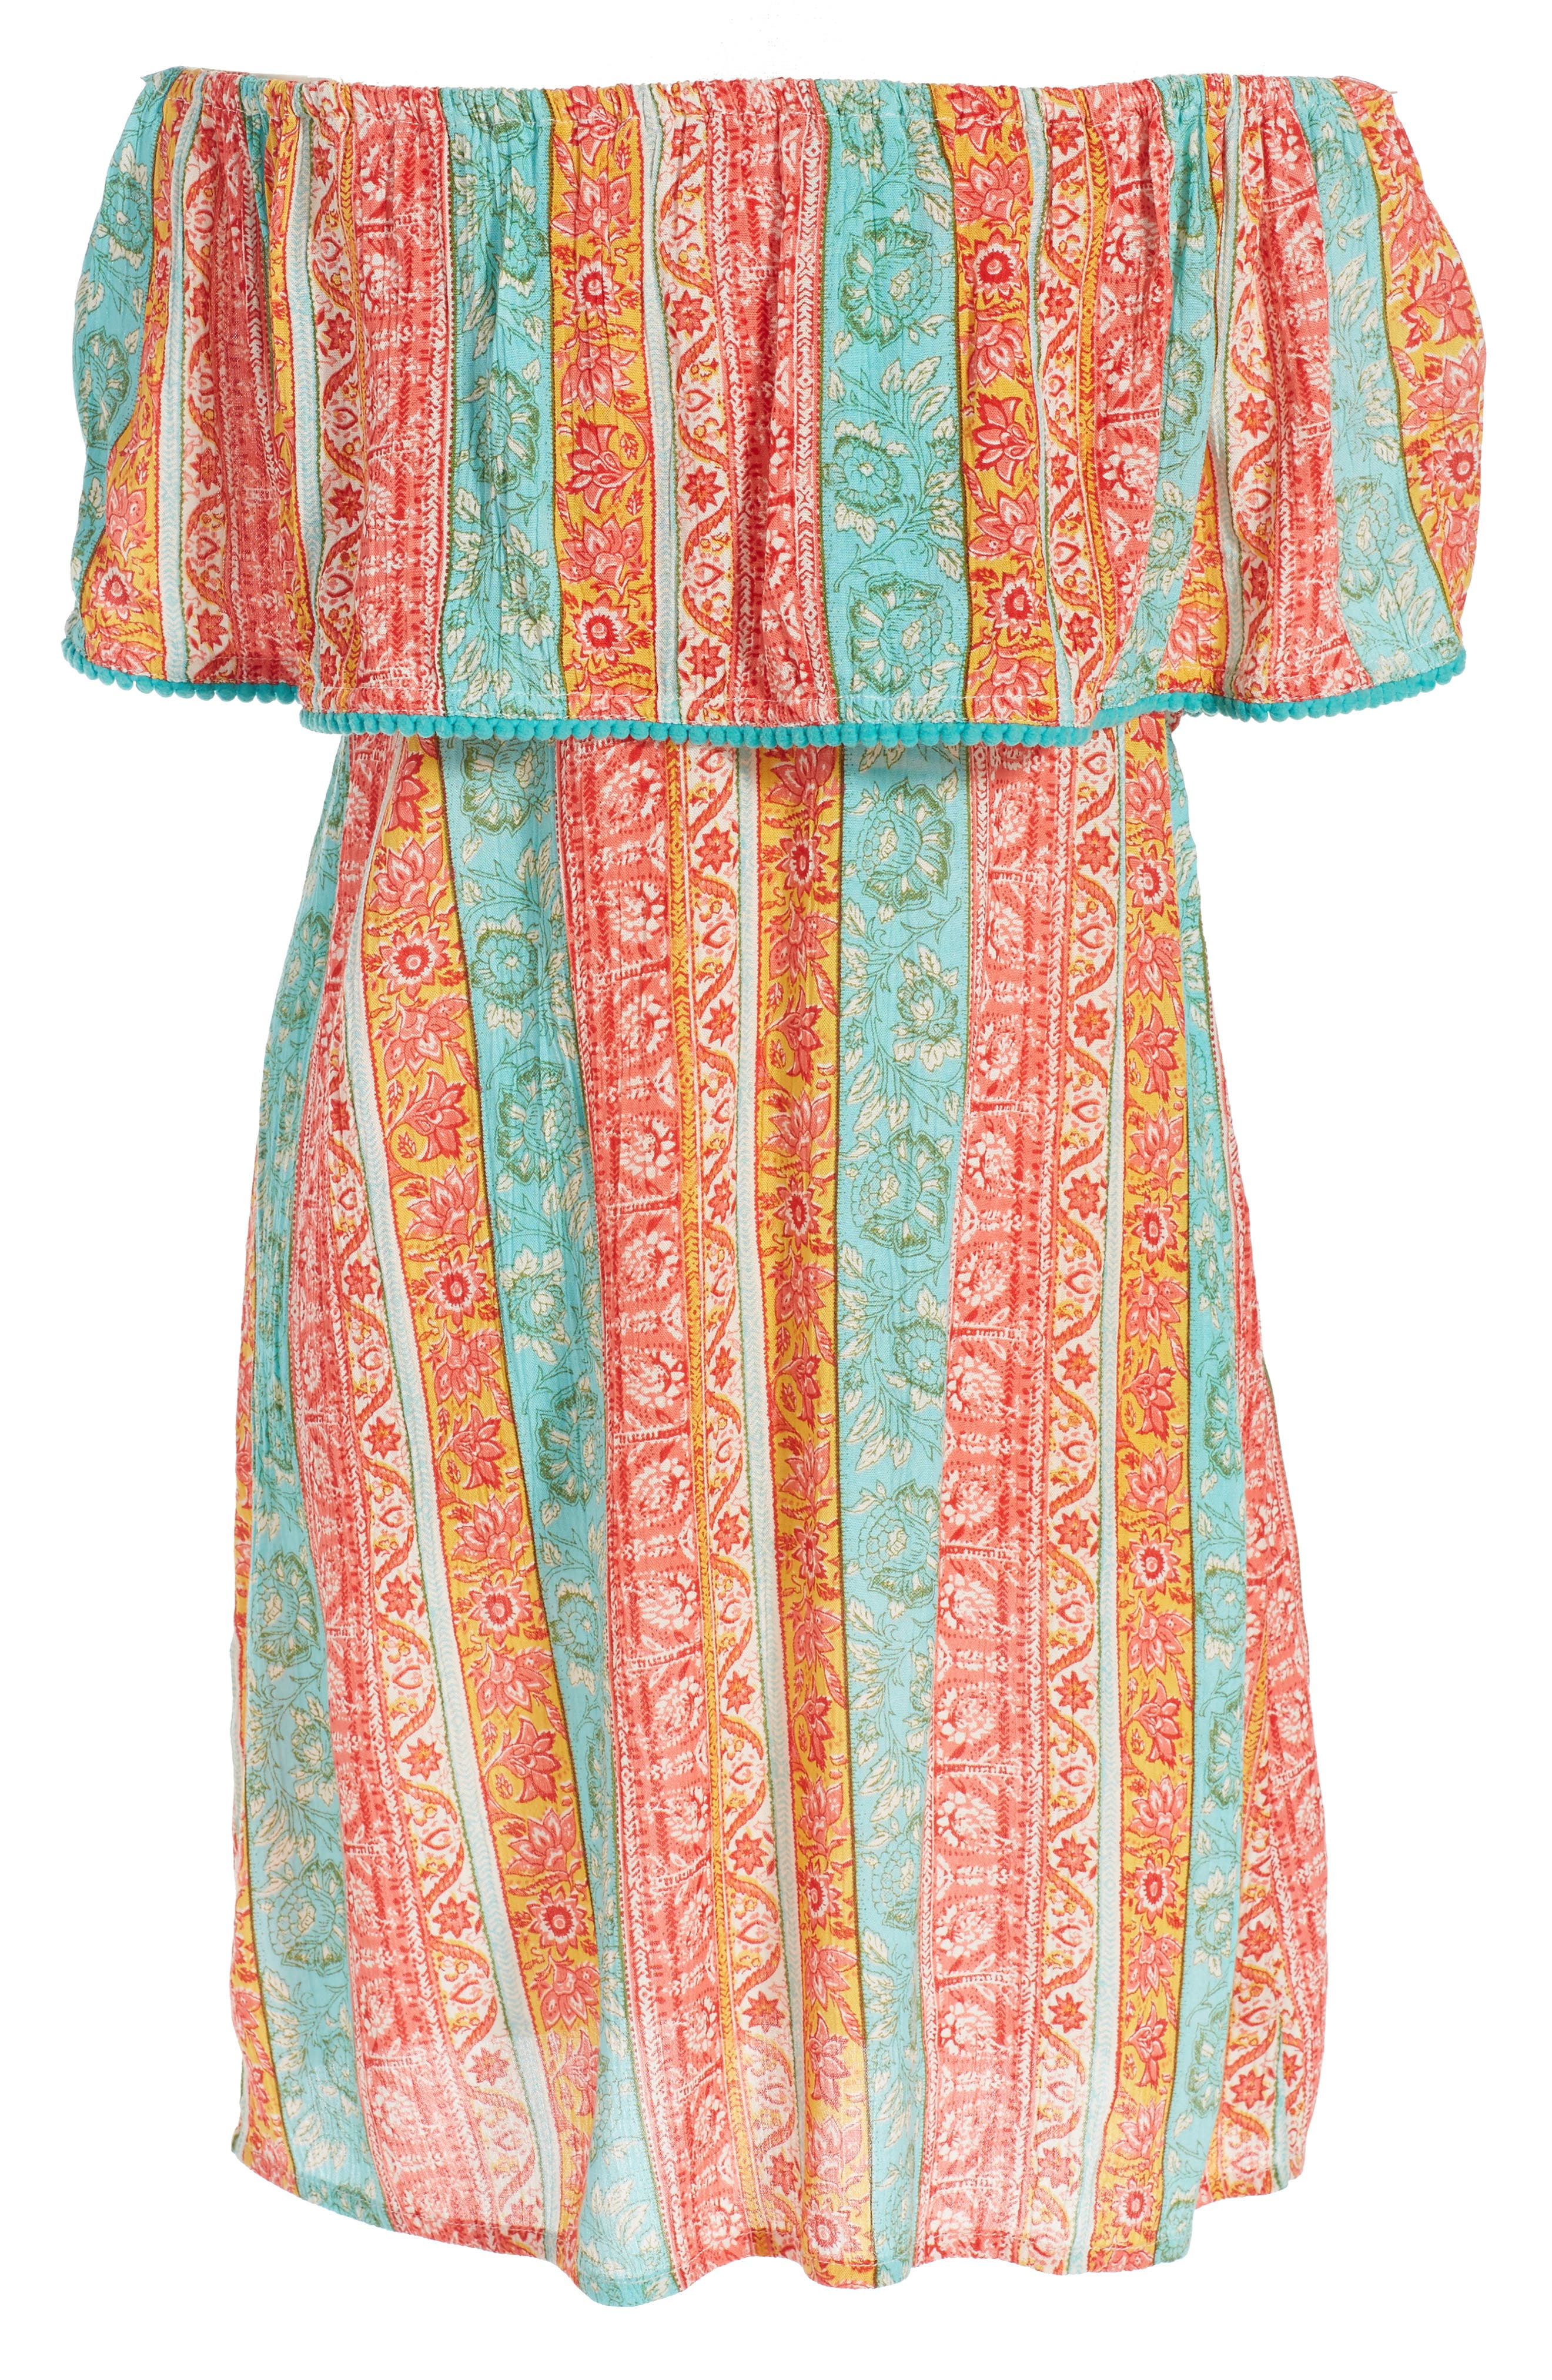 BILLABONG Cabana Ana Off the Shoulder Dress